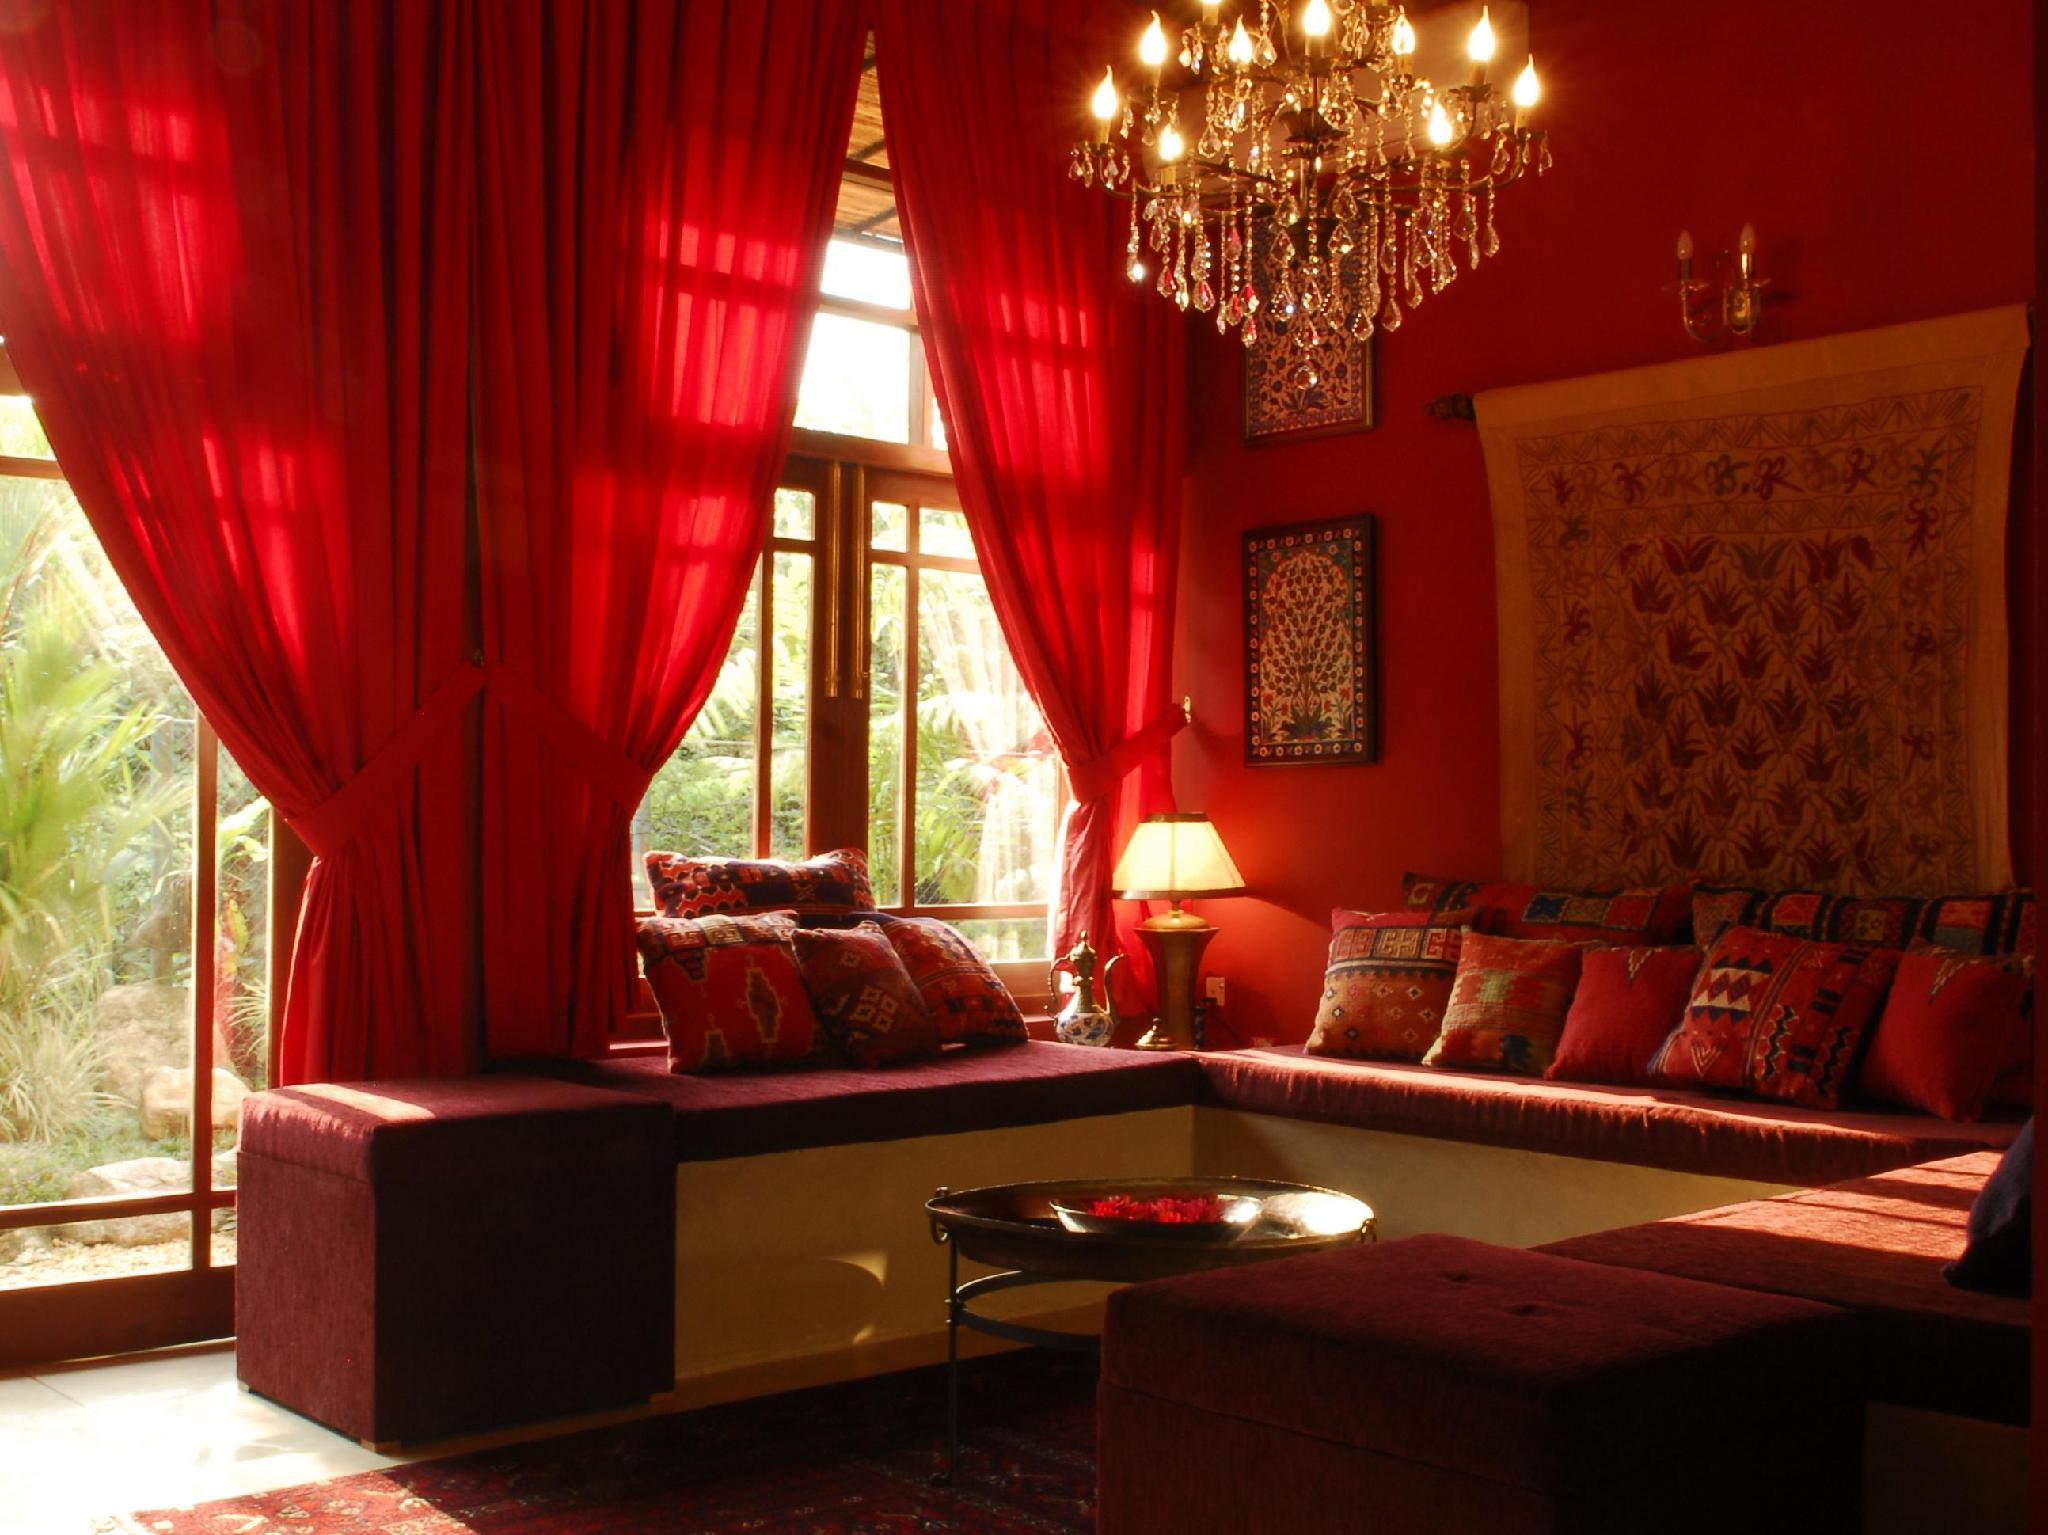 Colombo Marrakech Villa, Sri Jayawardanapura Kotte